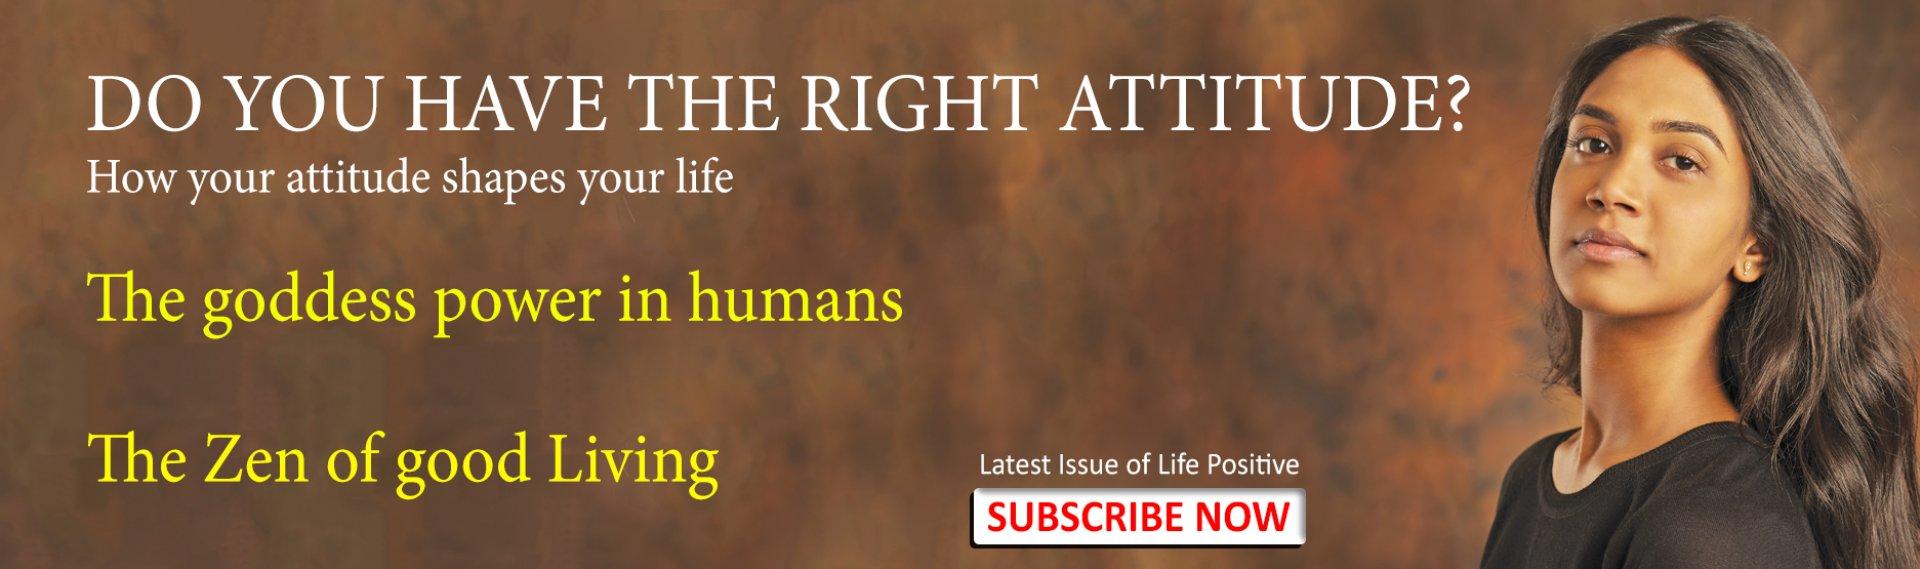 Life-Positive-Magazine-November-2020